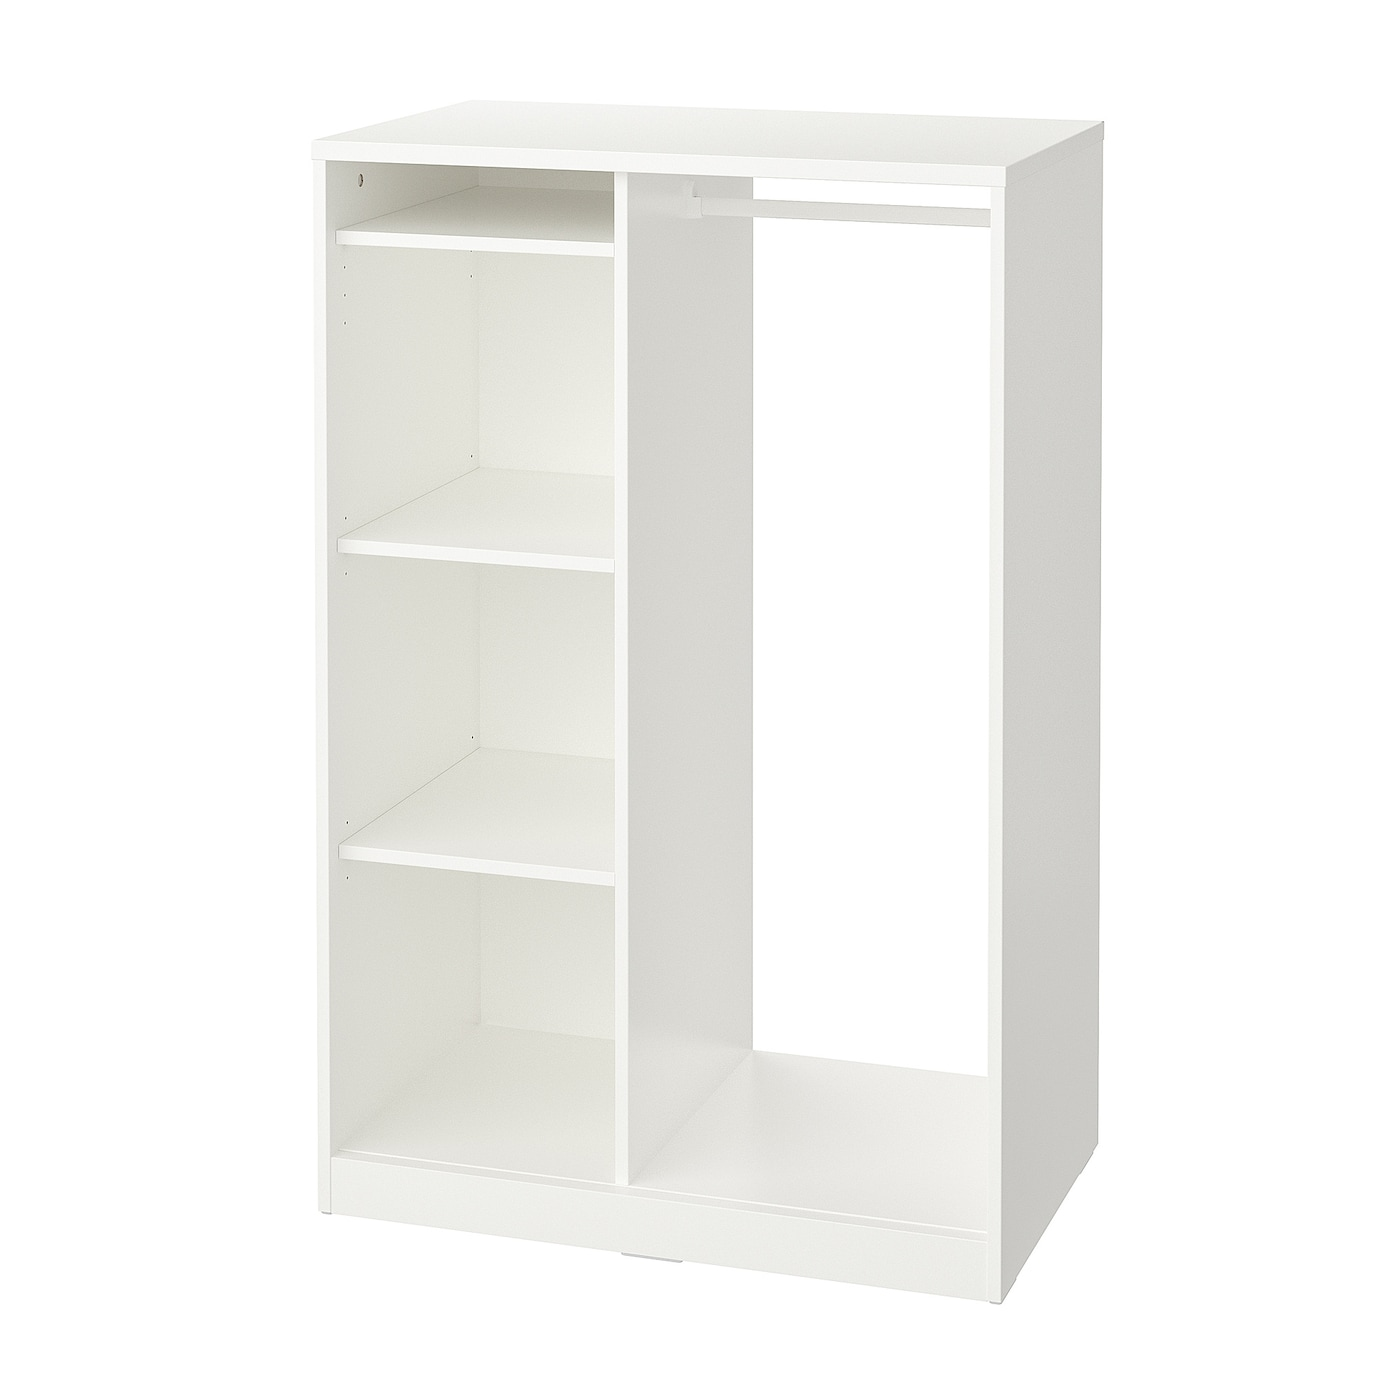 IKEA SYVDE Szafa otwarta, biały, 80x123 cm